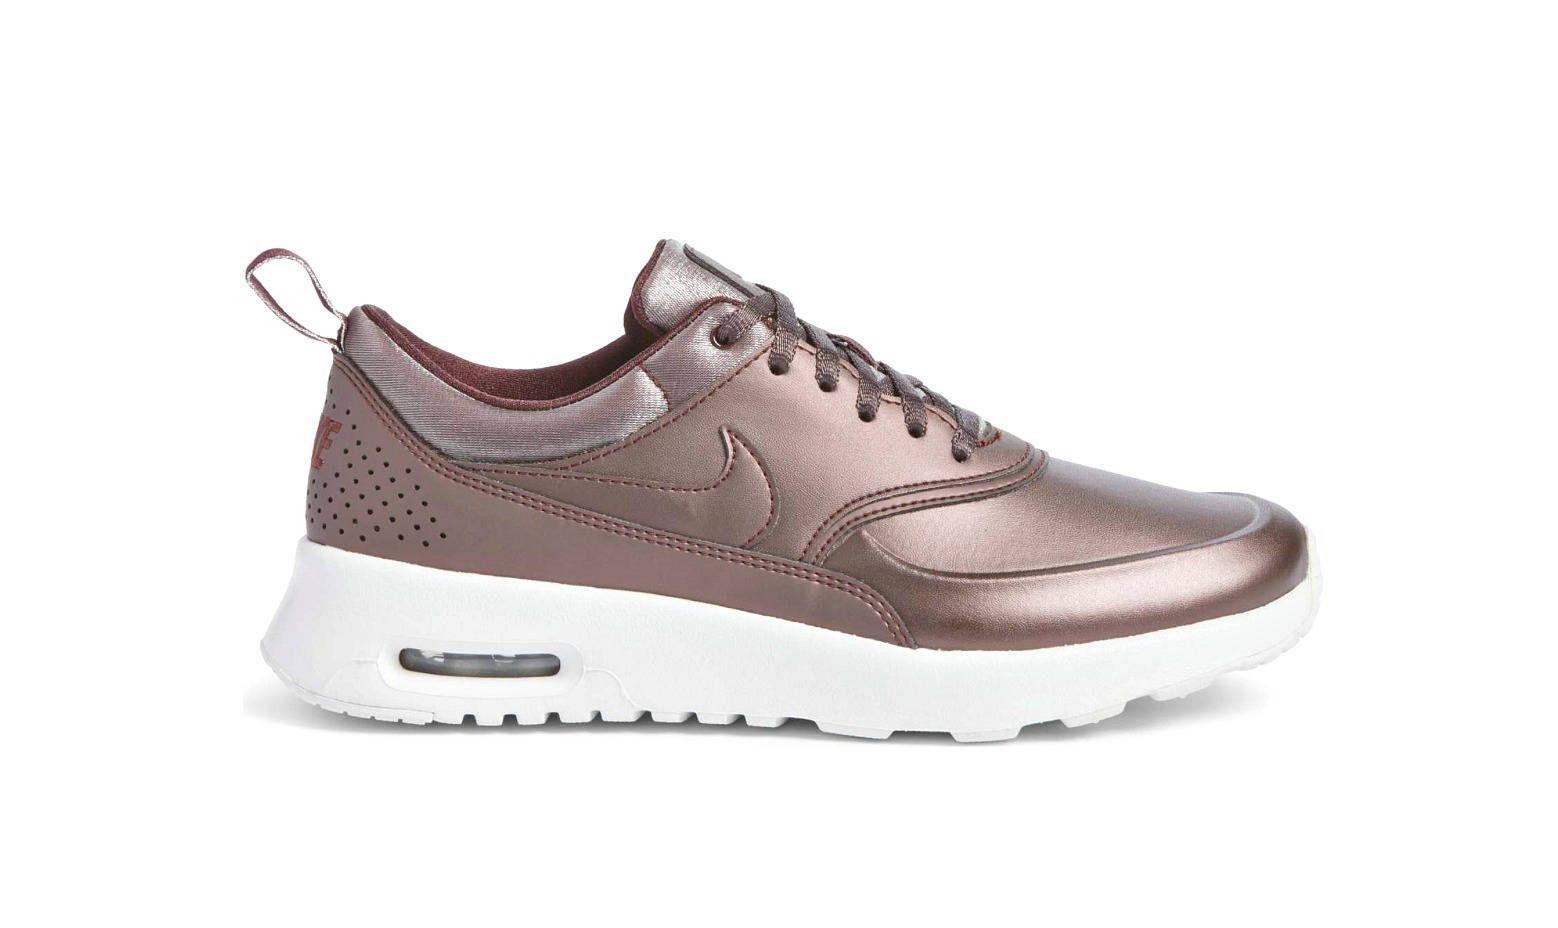 Swarovski Nike - Air Max Thea - Bling Nike shoes - Rose Gold Shoes-Nike  Swarovski- Nike Shoes - Bling shoes - Bling nikes-Rose Gold Sneakers by ... 33d8d503816b